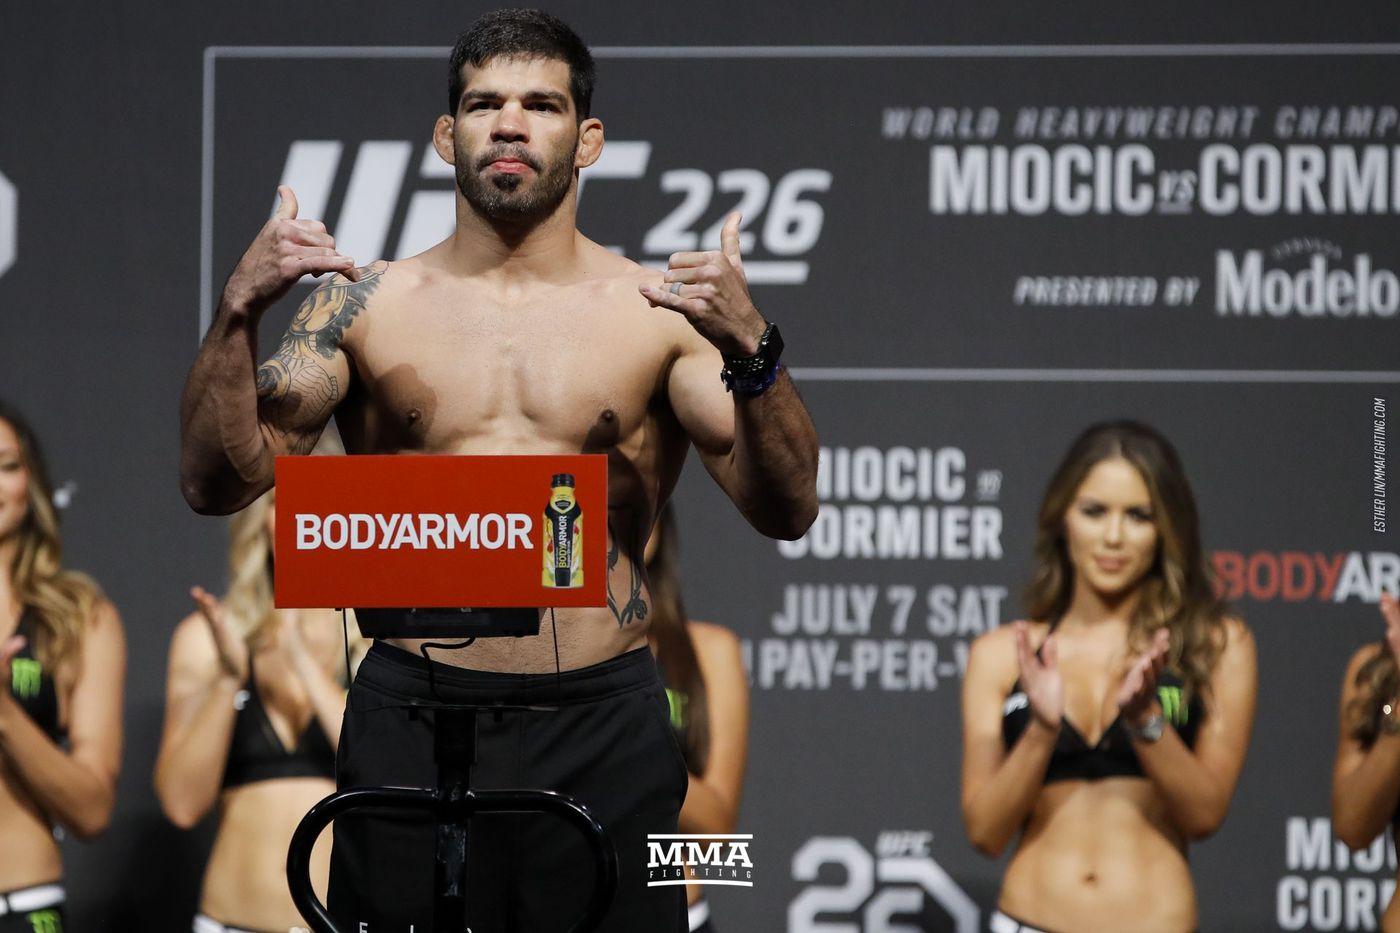 Raphael Assuncao vs. Raoni Barcelos set for UFC event on Feb. 27 - MMA Fighting